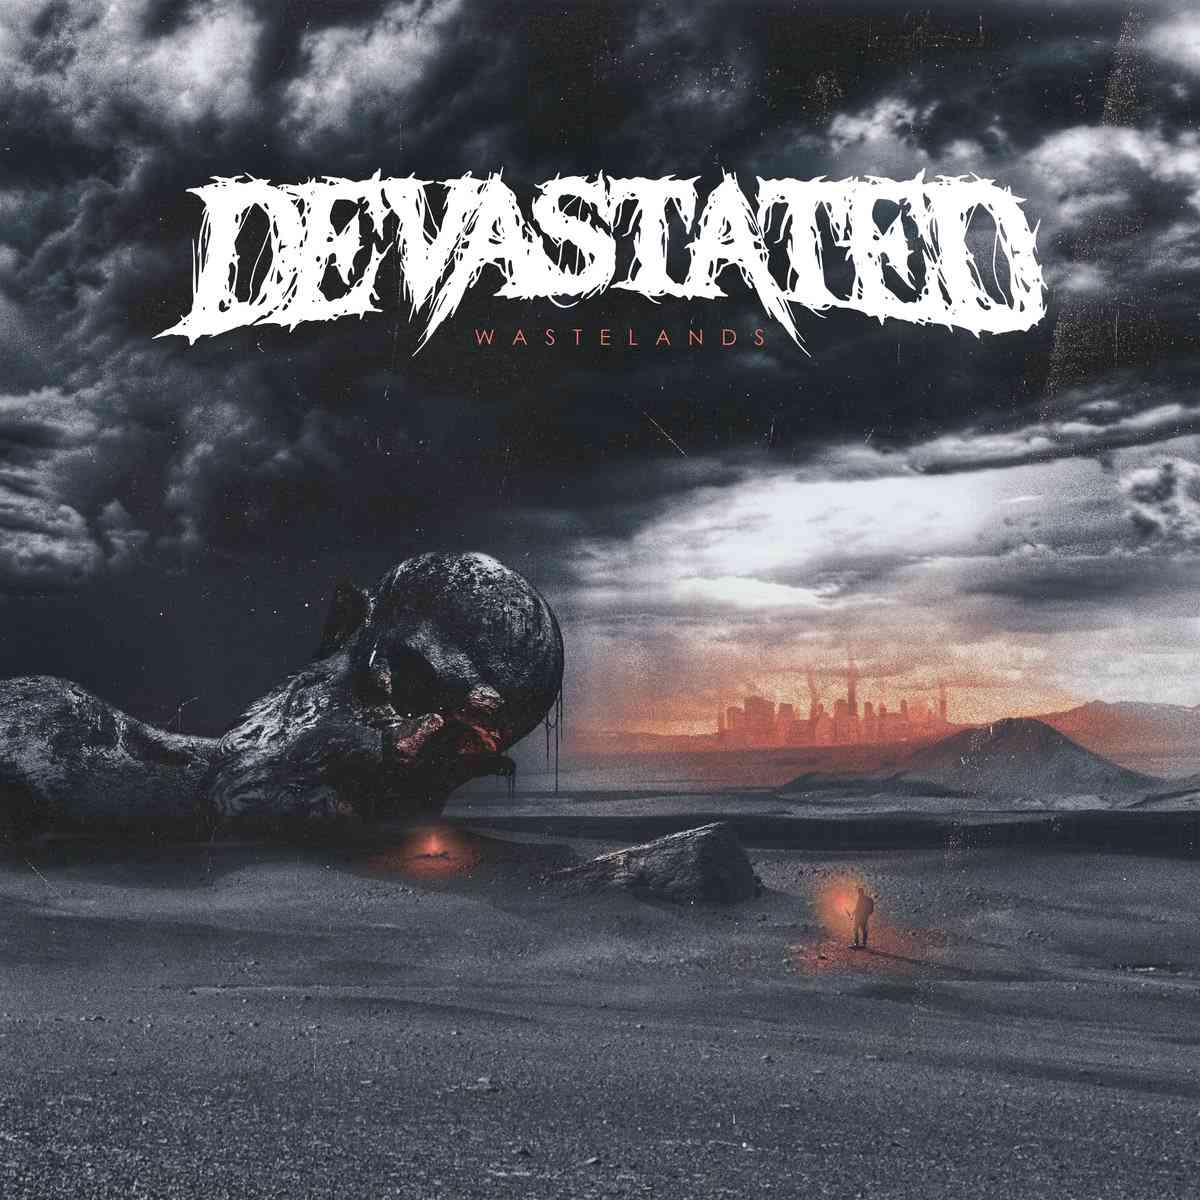 devastated - wastelands - album cover